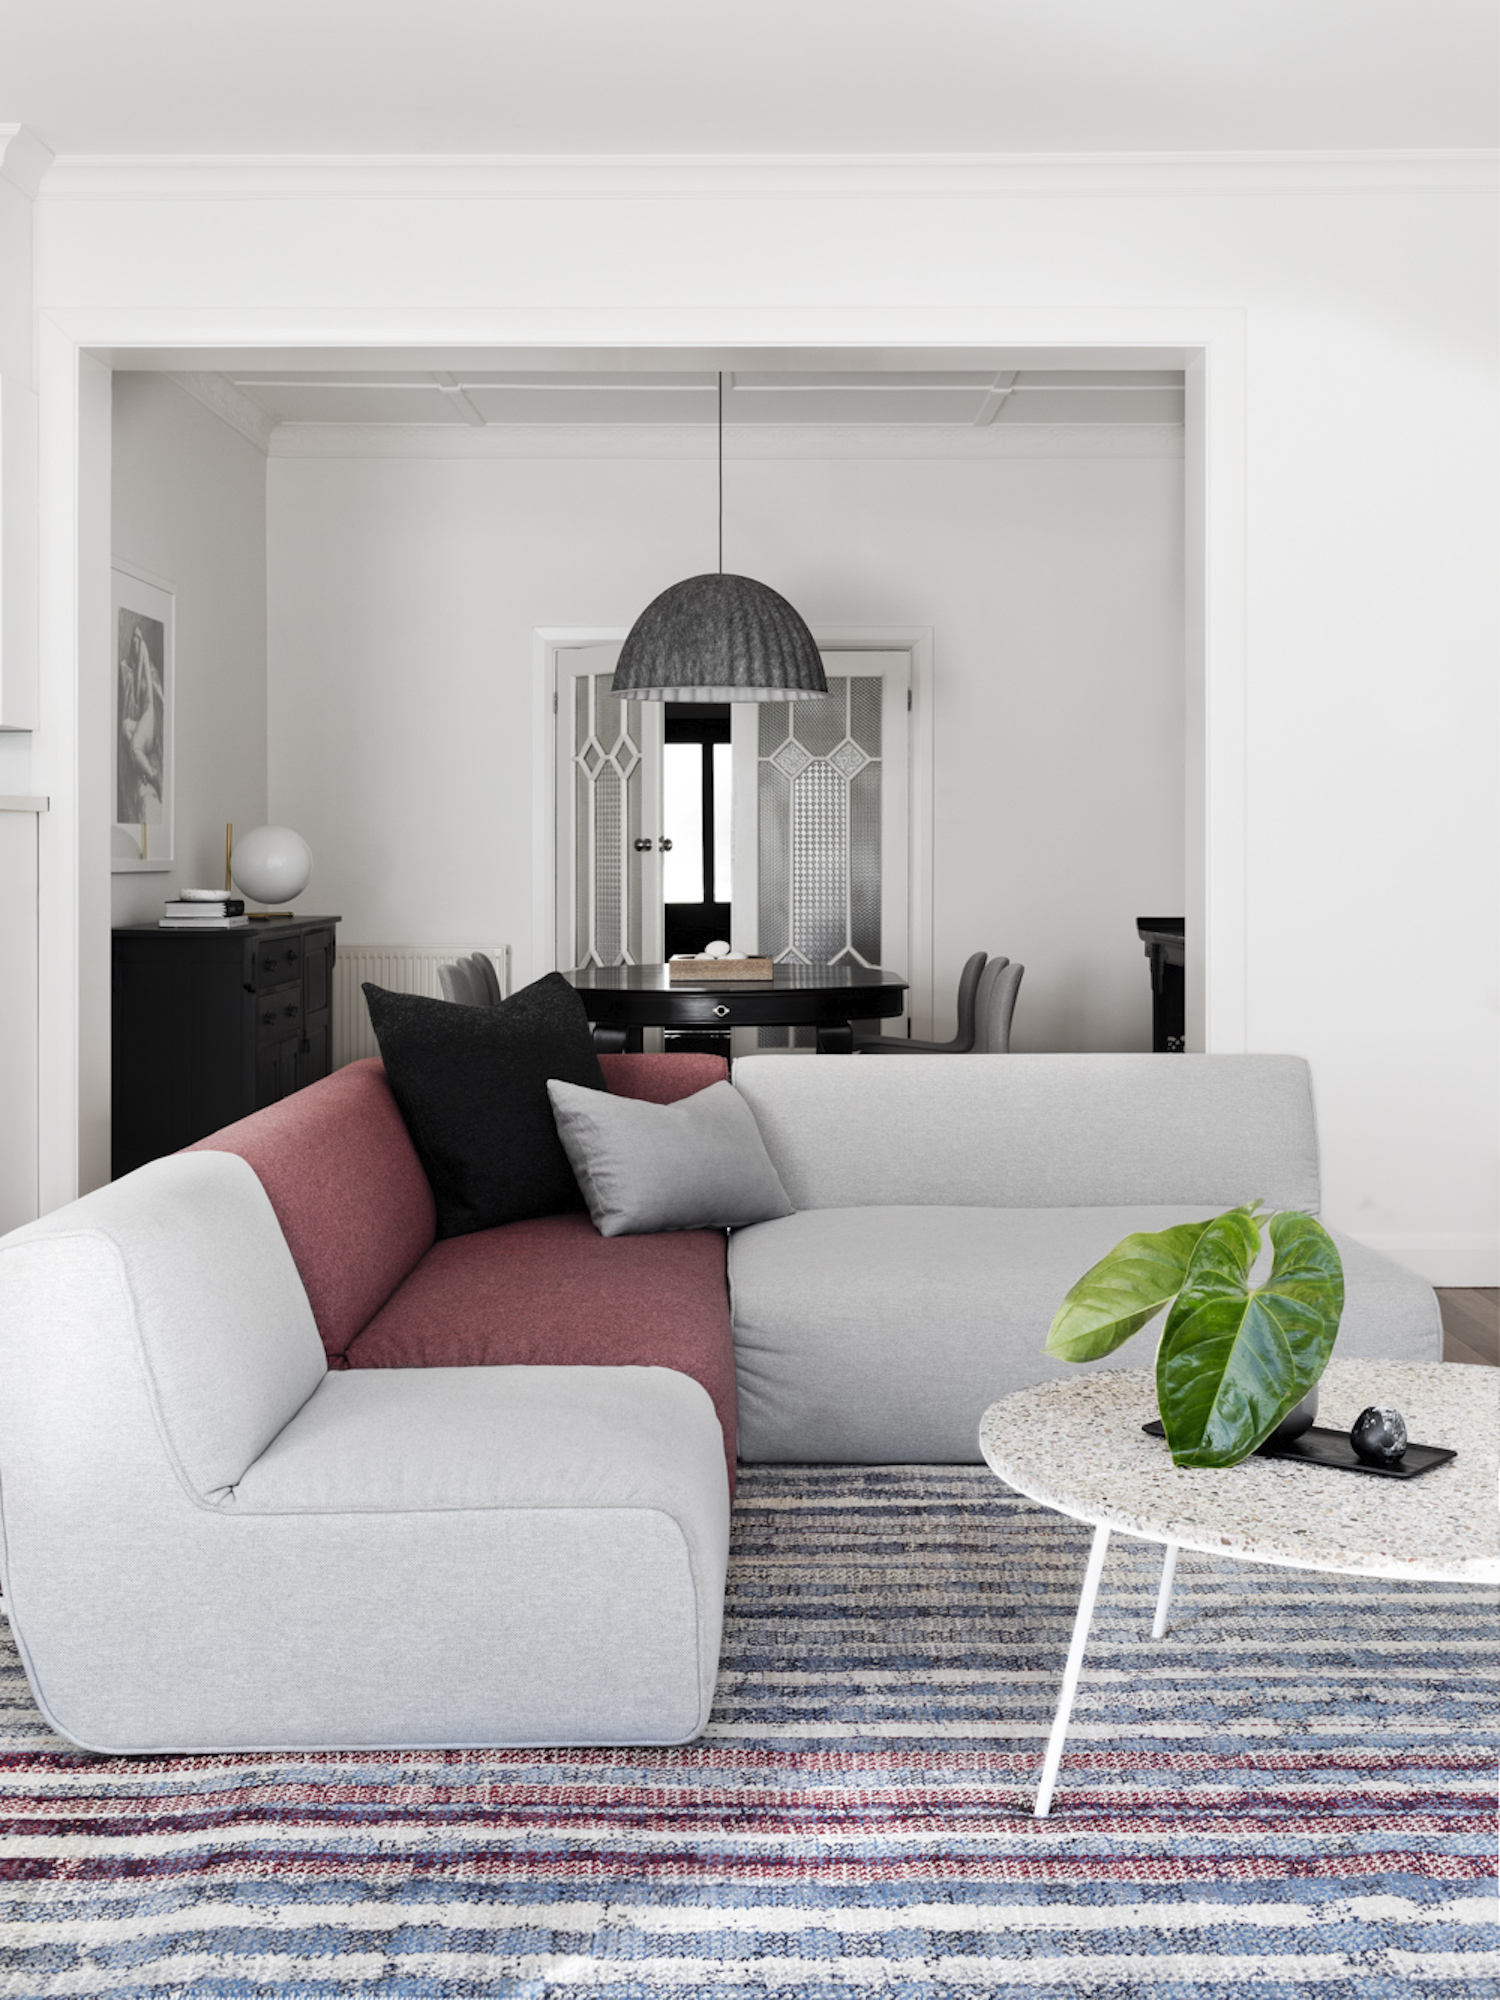 est living studio griffiths ivanhoe residence 1